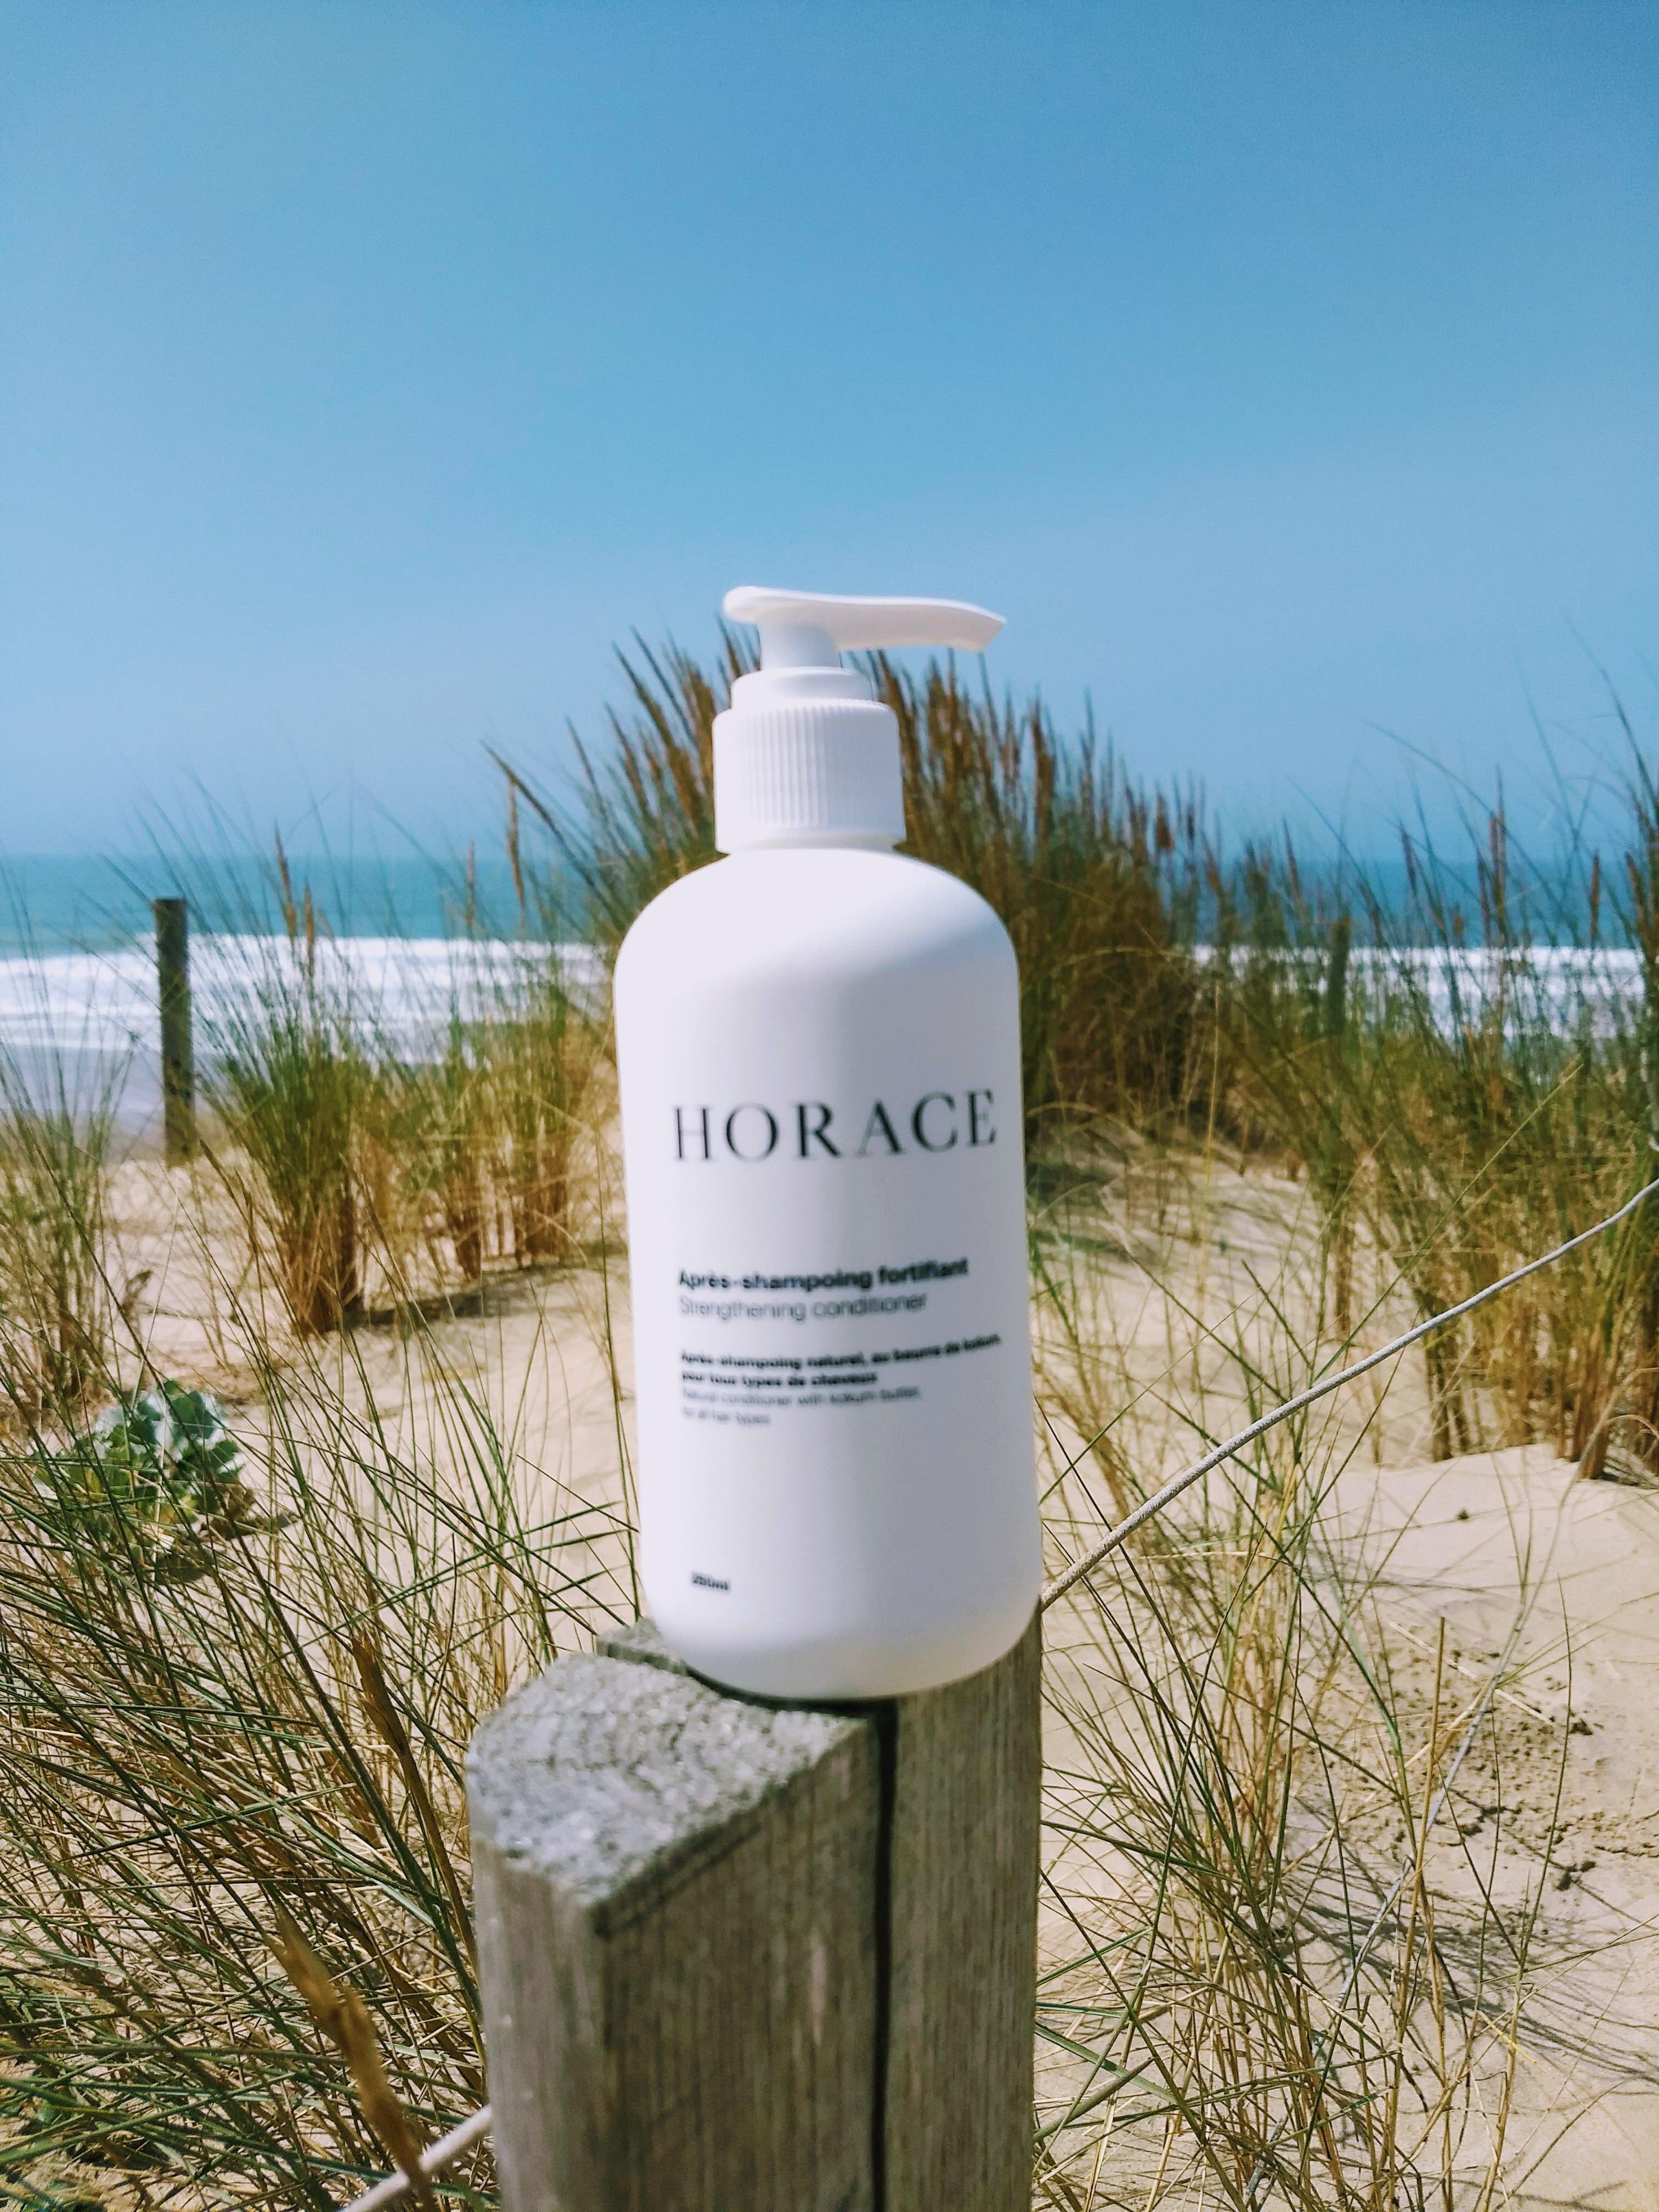 apres shampoing horace avis